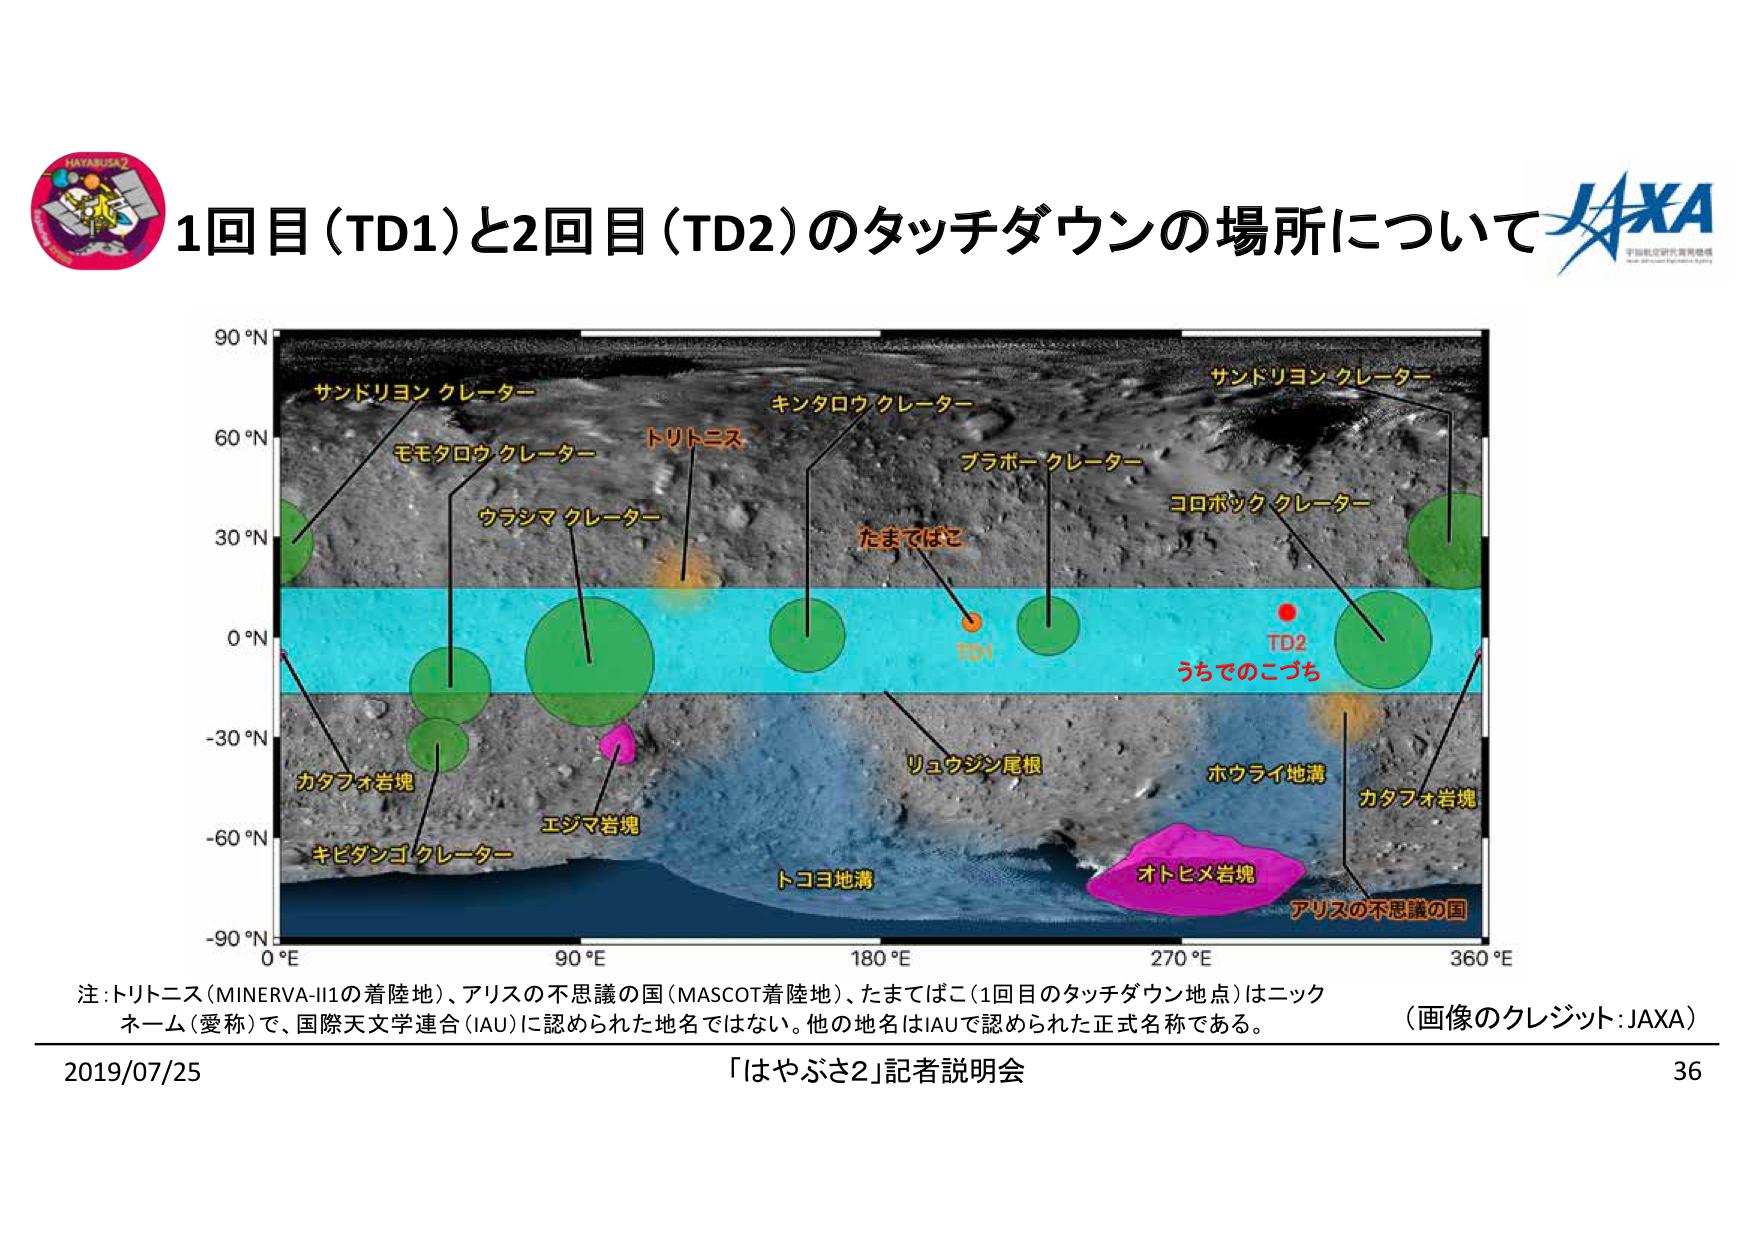 f:id:Imamura:20190725151434p:plain